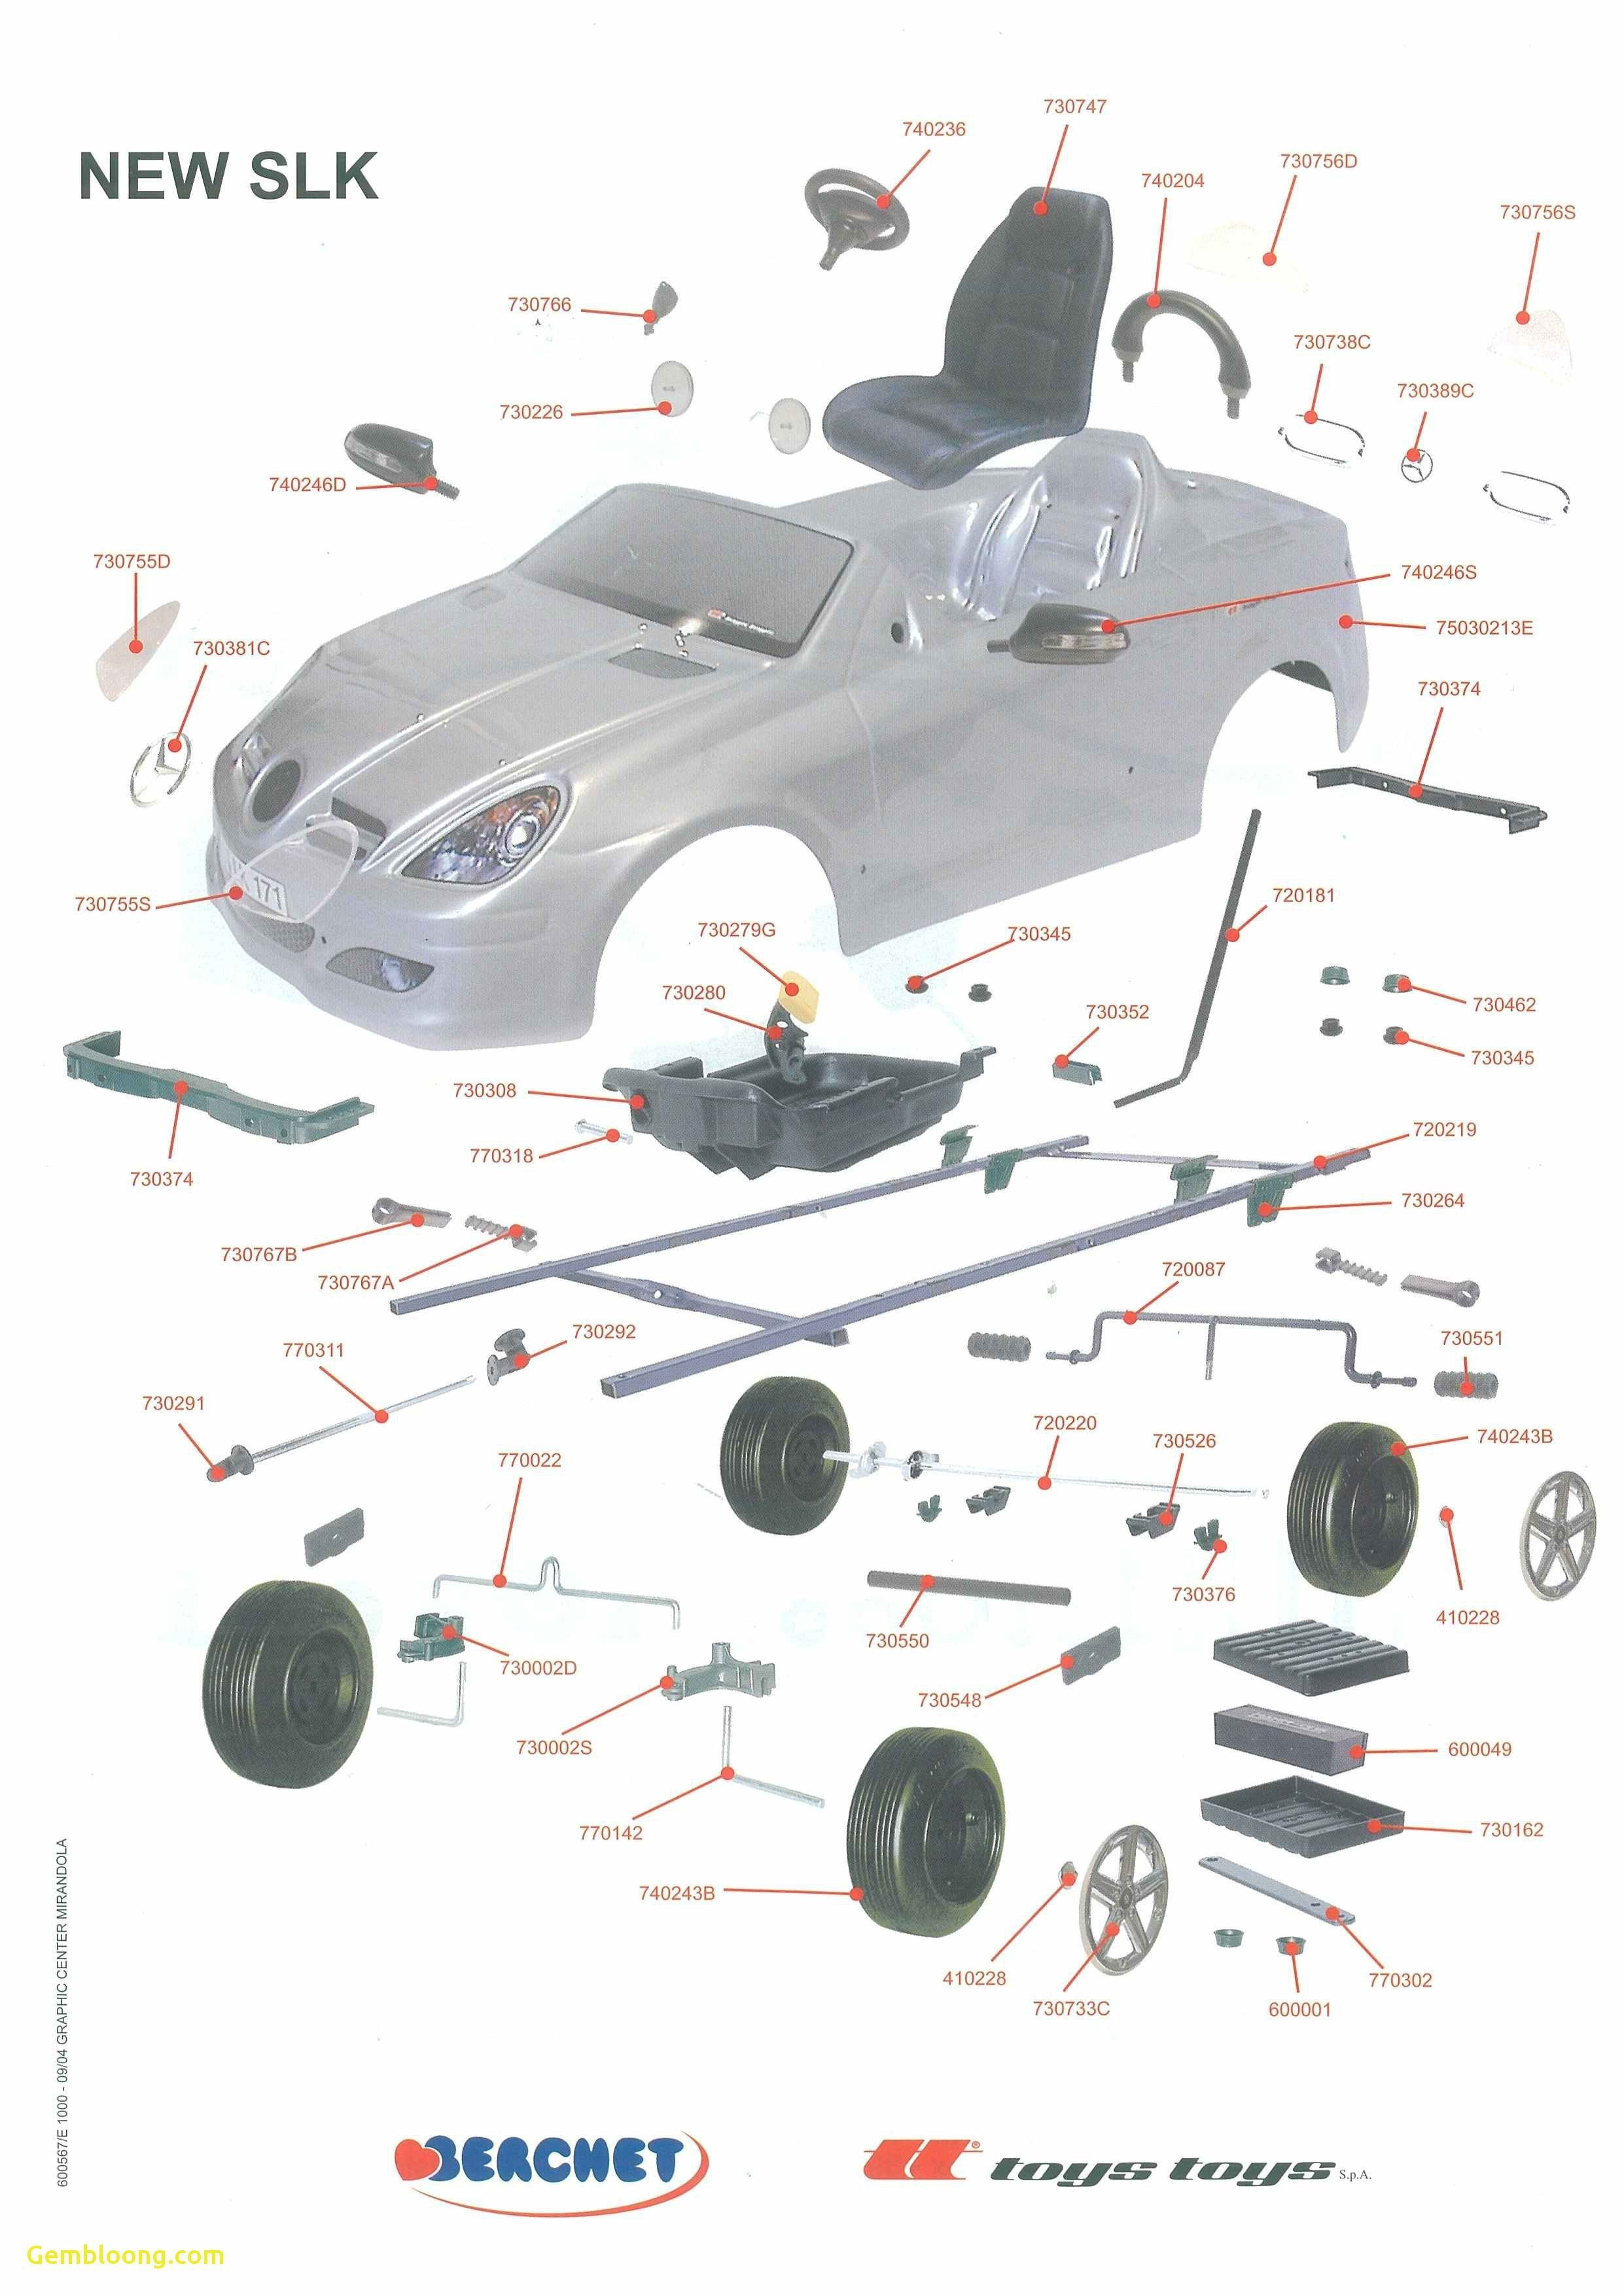 Car Diagram Parts Awesome Car Free Body Diagram Of Car Diagram Parts